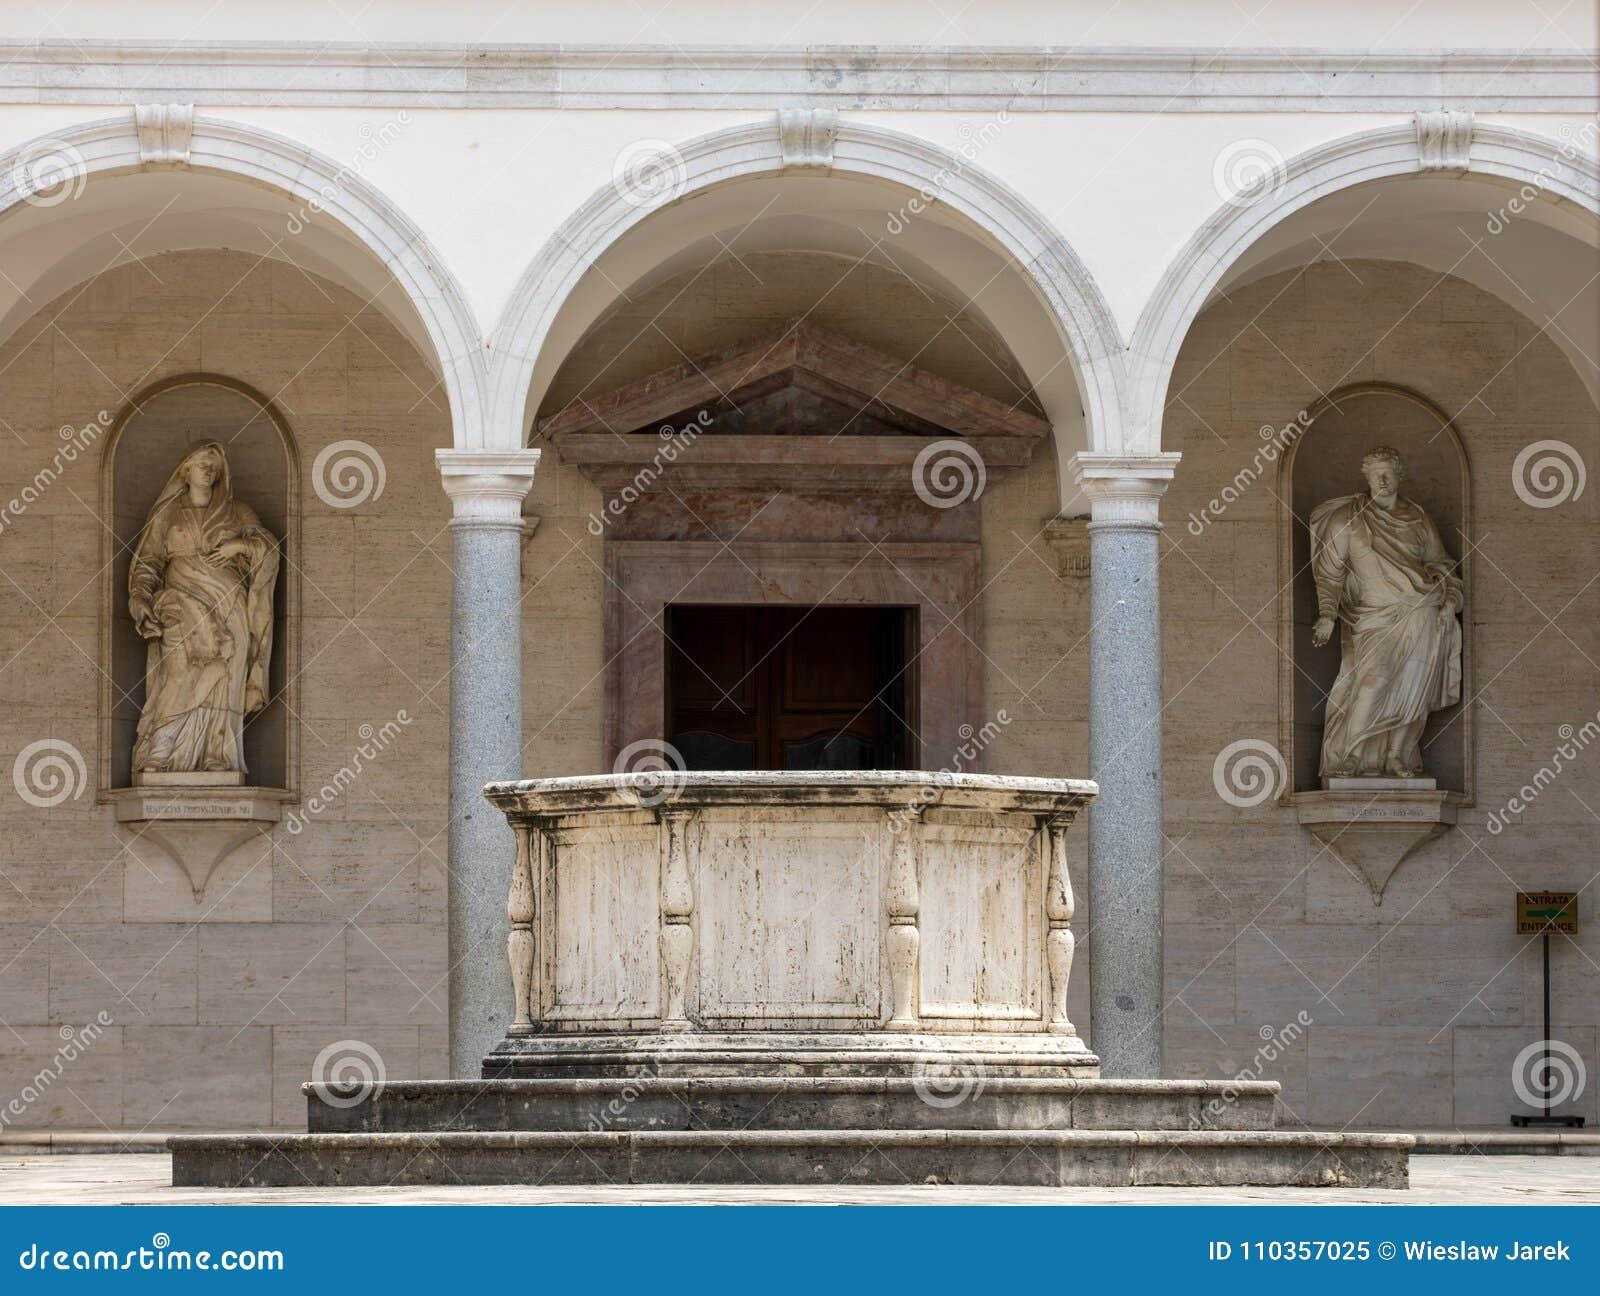 Claustro da abadia do licor beneditino de Monte Cassino Italy